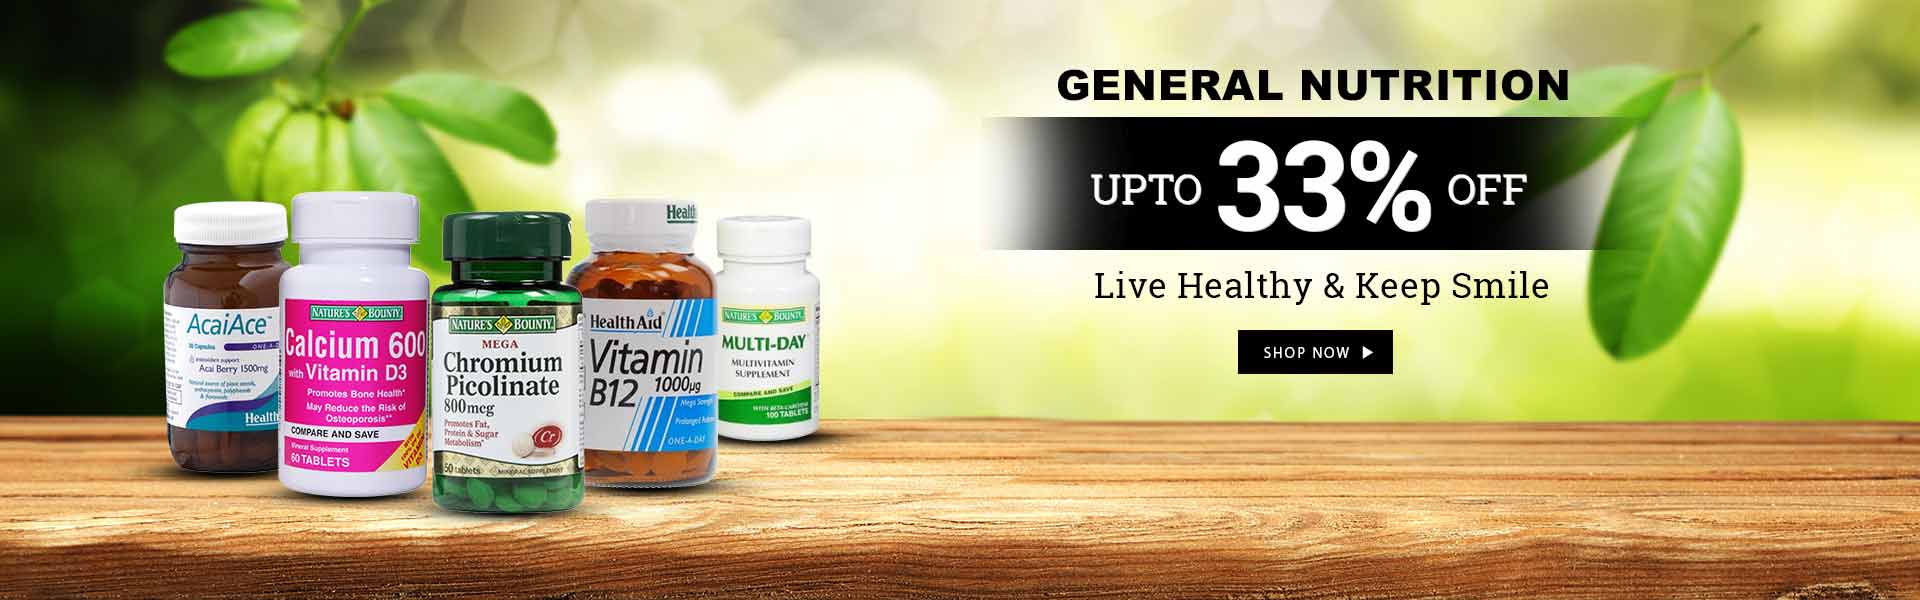 general-nutrition-deals-banner